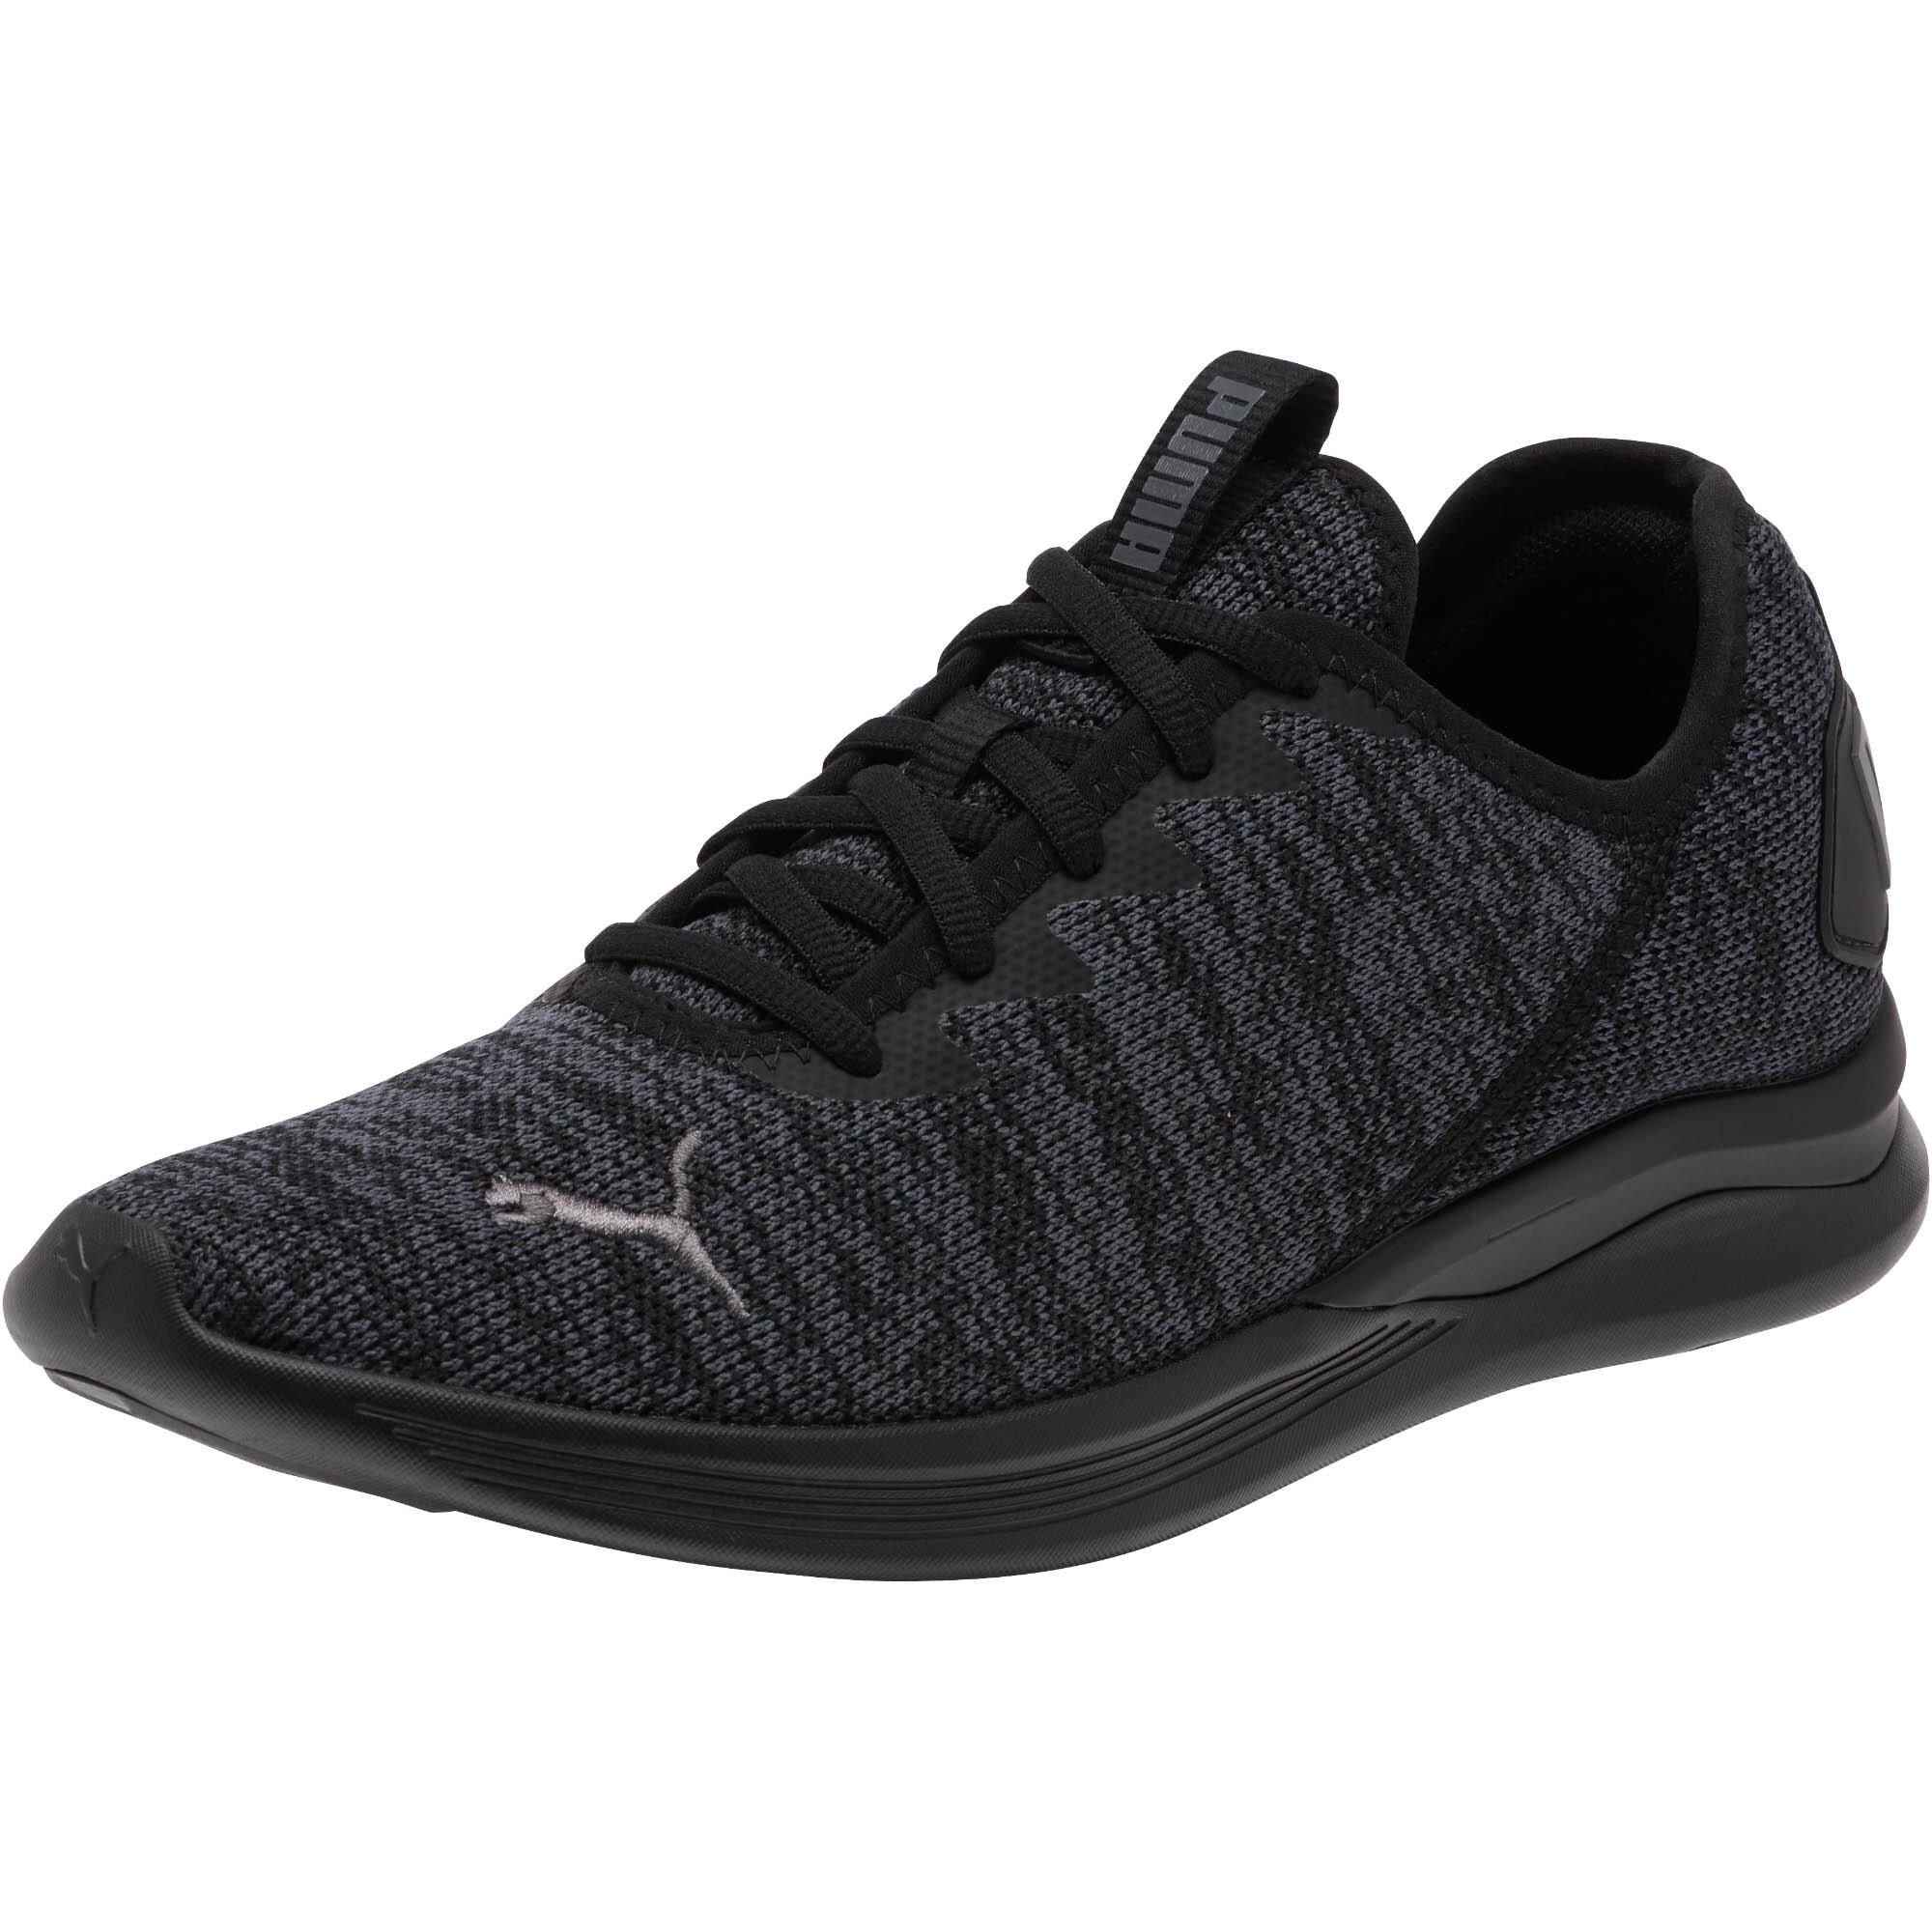 PUMA-Ballast-Men-039-s-Running-Shoes-Men-Shoe-Running miniatura 16